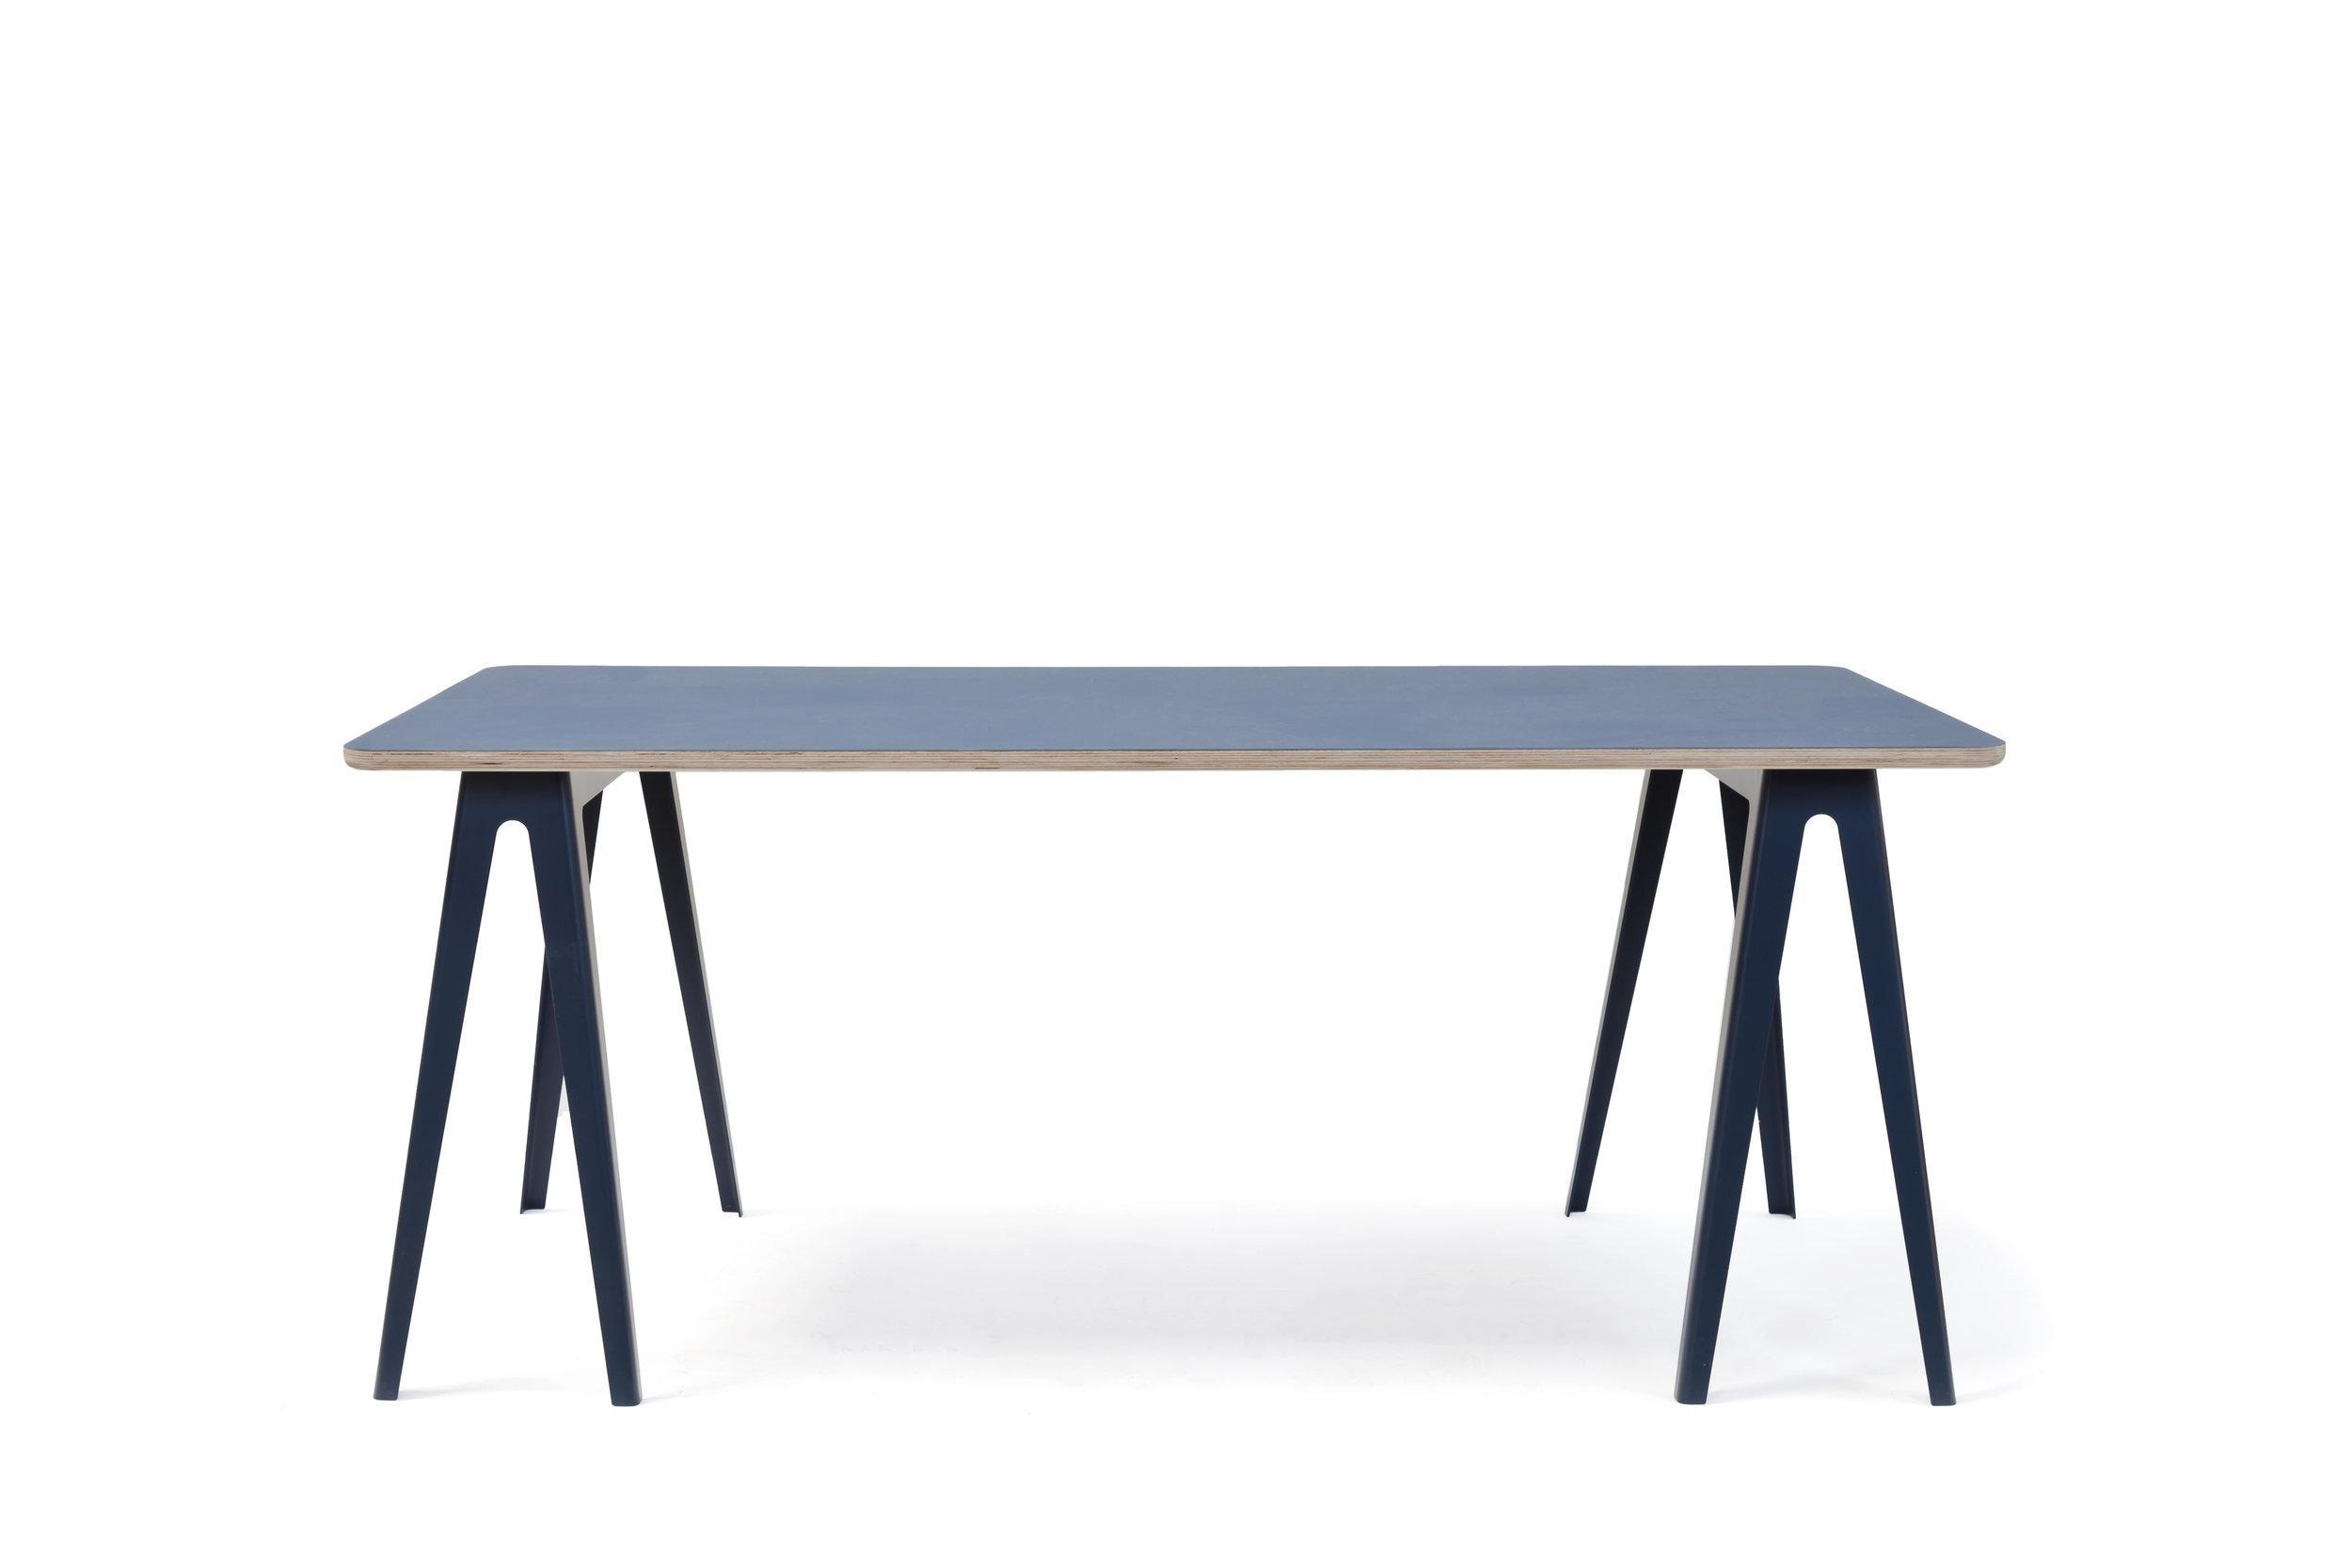 Vij5-Trestle-Table-by-David-Derksen-IMG_8374-2018-image-by-Vij5-.jpg